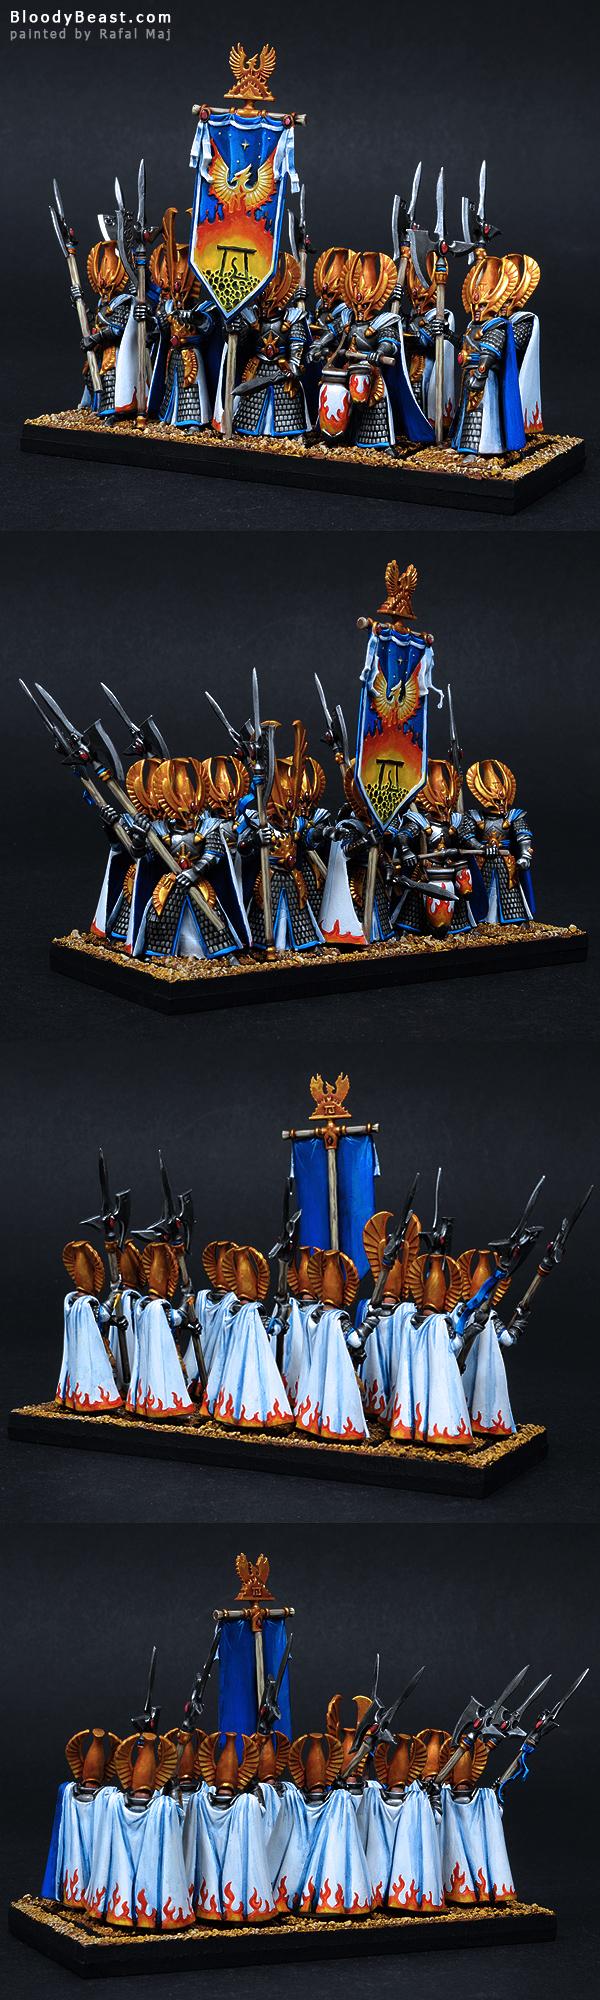 High Elves Phoenix Guard painted by Rafal Maj (BloodyBeast.com)